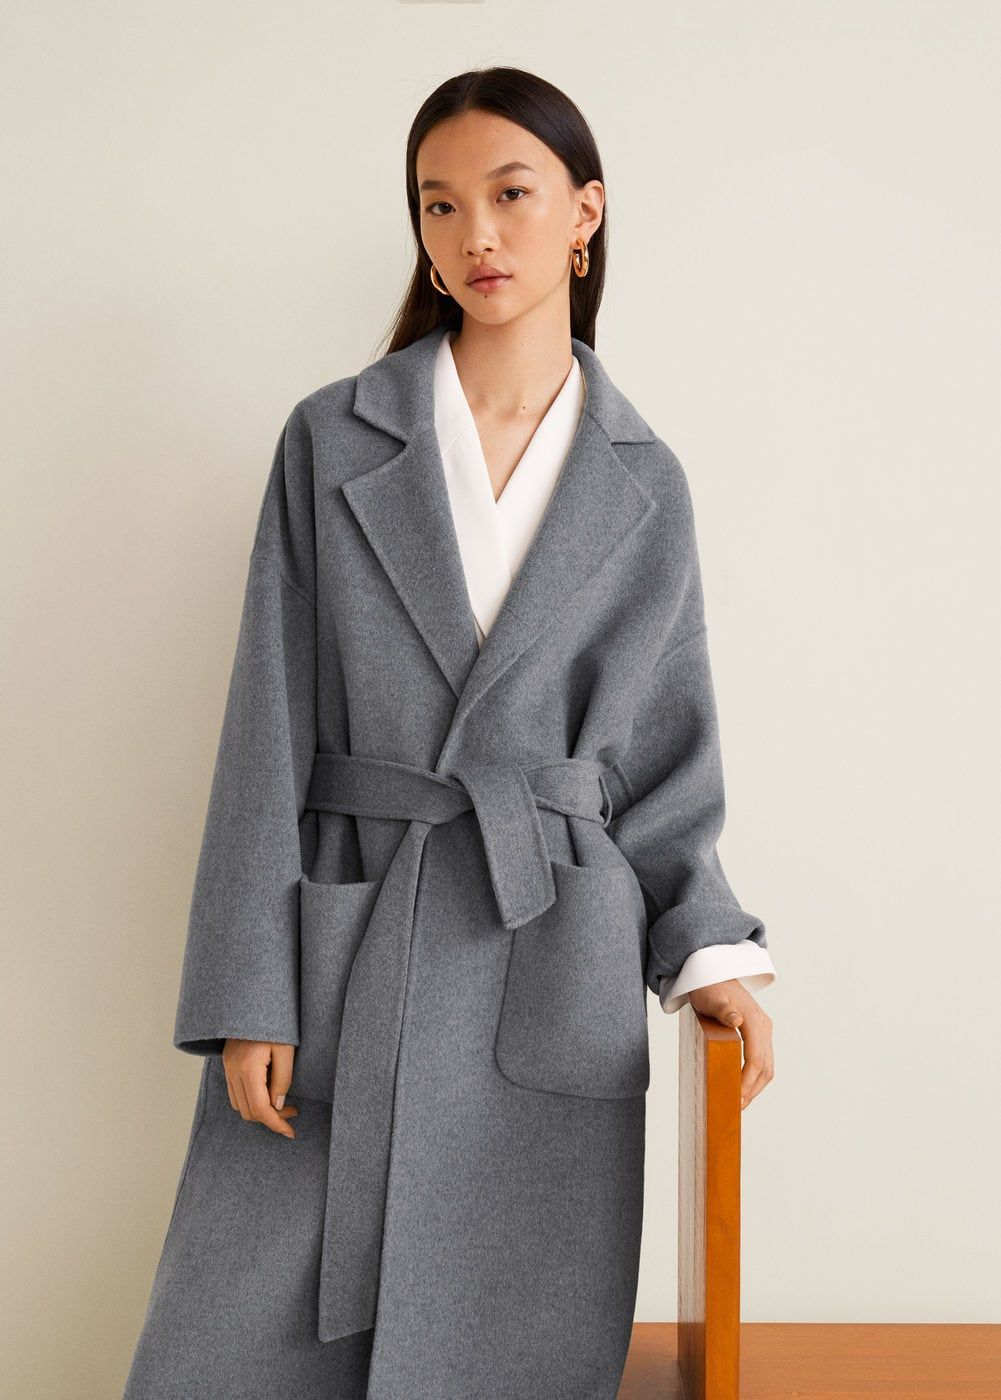 Unstructured wool blend coat Woman | Mango Estonia | Coats